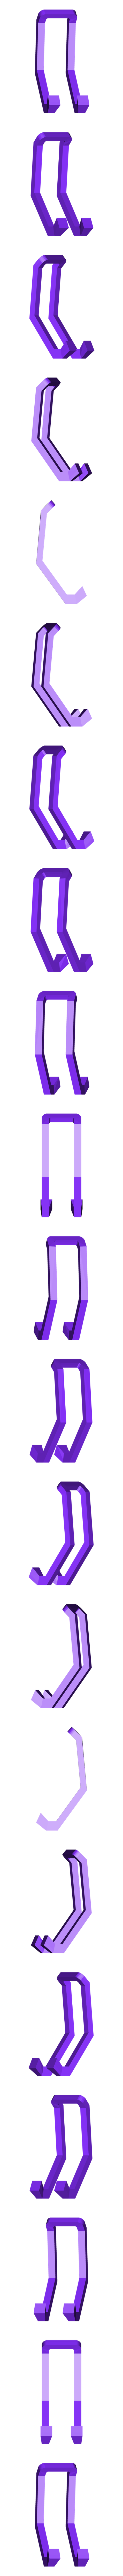 REARGUARD.stl Download free STL file walking robots fan art kossak • 3D print template, TomasLA